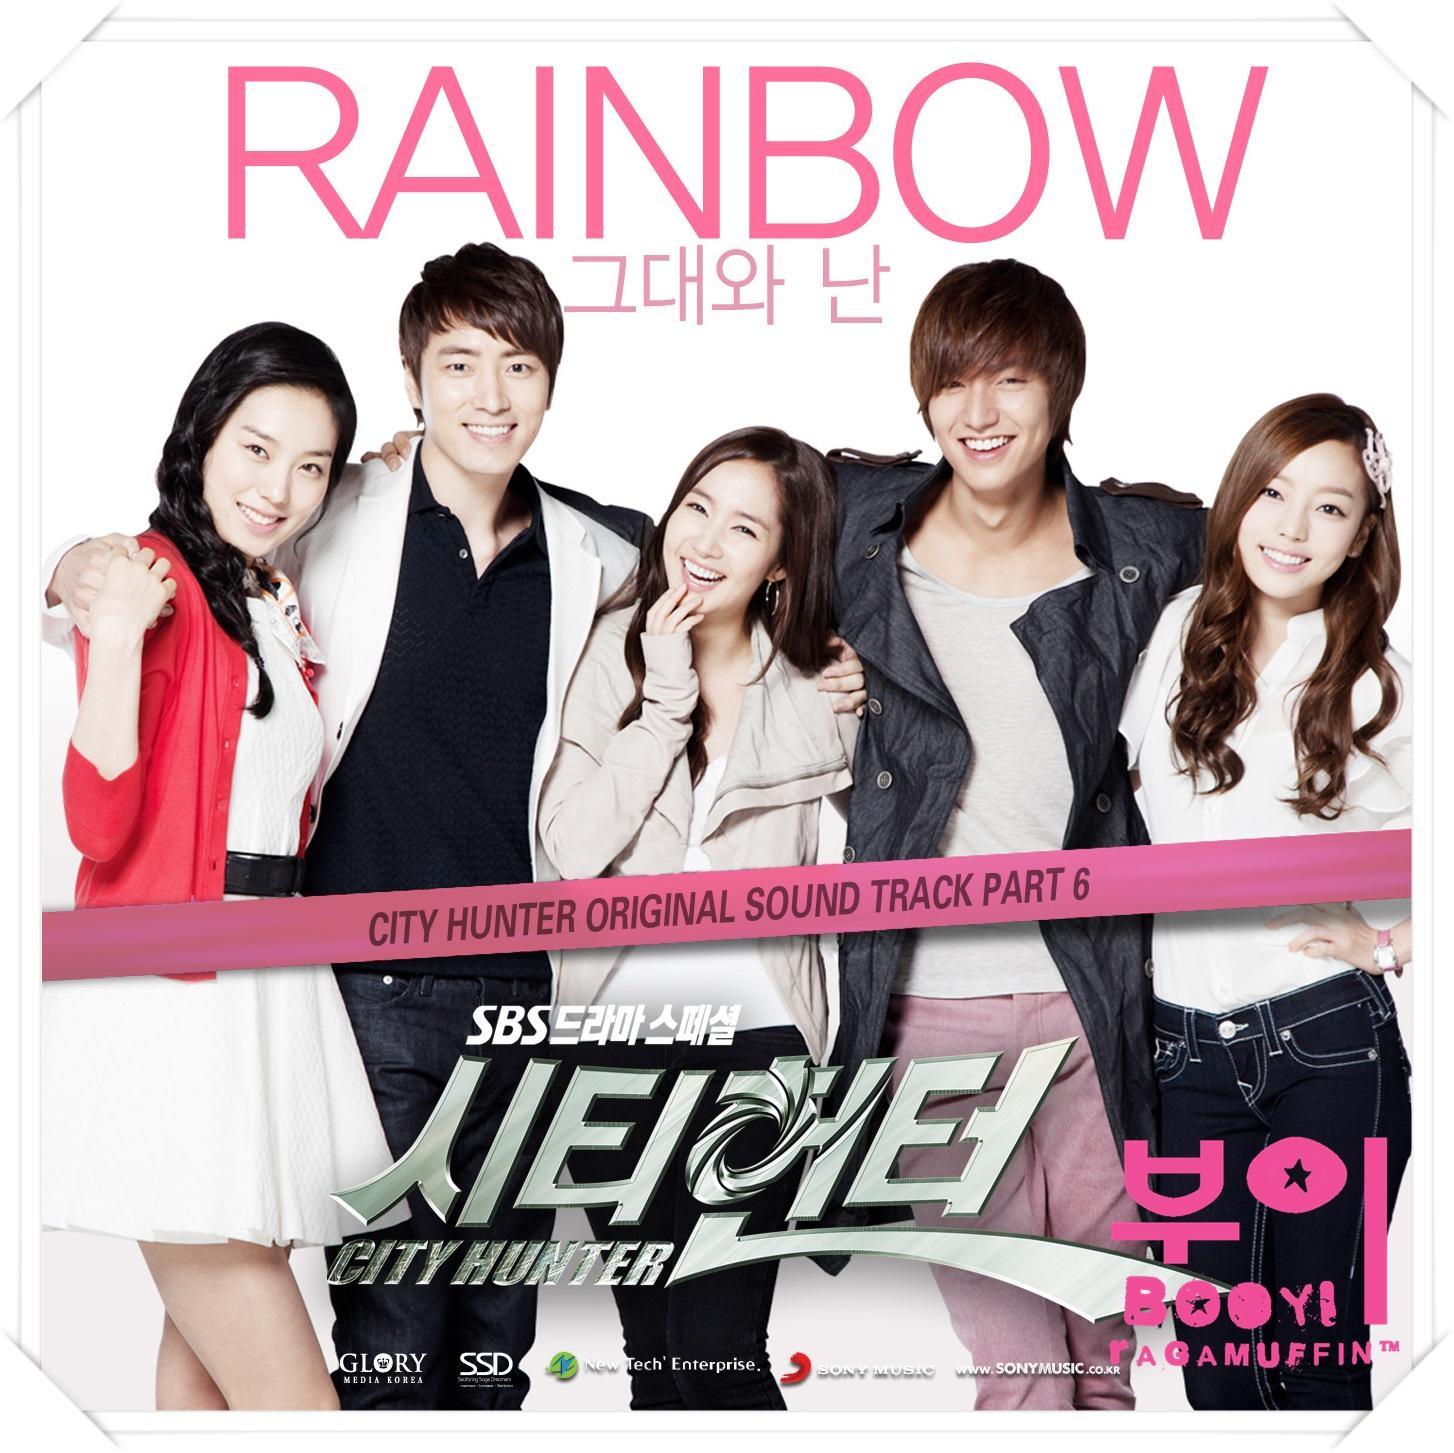 City Hunter Ost Love: Rainbow (레인보우) 그대와 난 (Geudaewa Nan) [City Hunter OST